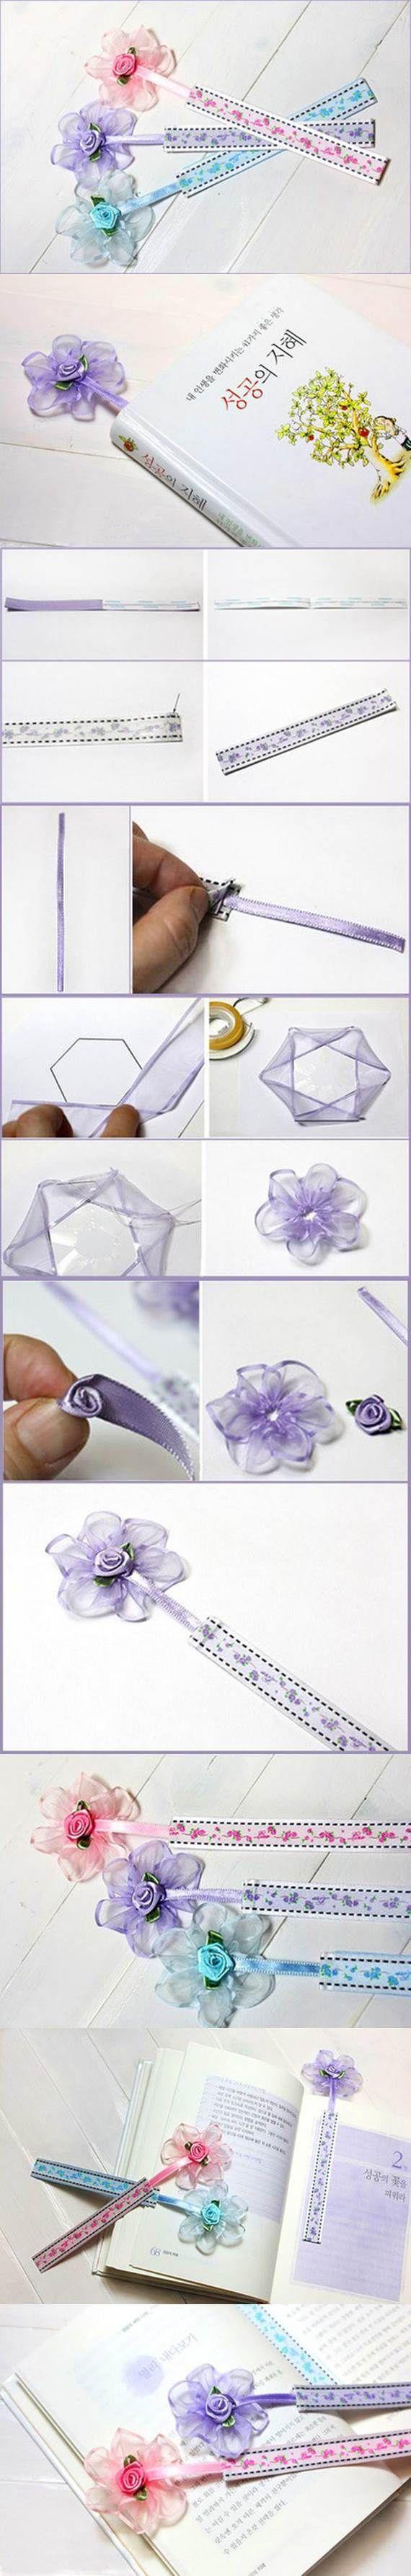 DIY Beautiful Ribbon Flower Bookmarks 2 http://www.icreativeideas.com/diy-beautiful-ribbon-flower-bookmarks/